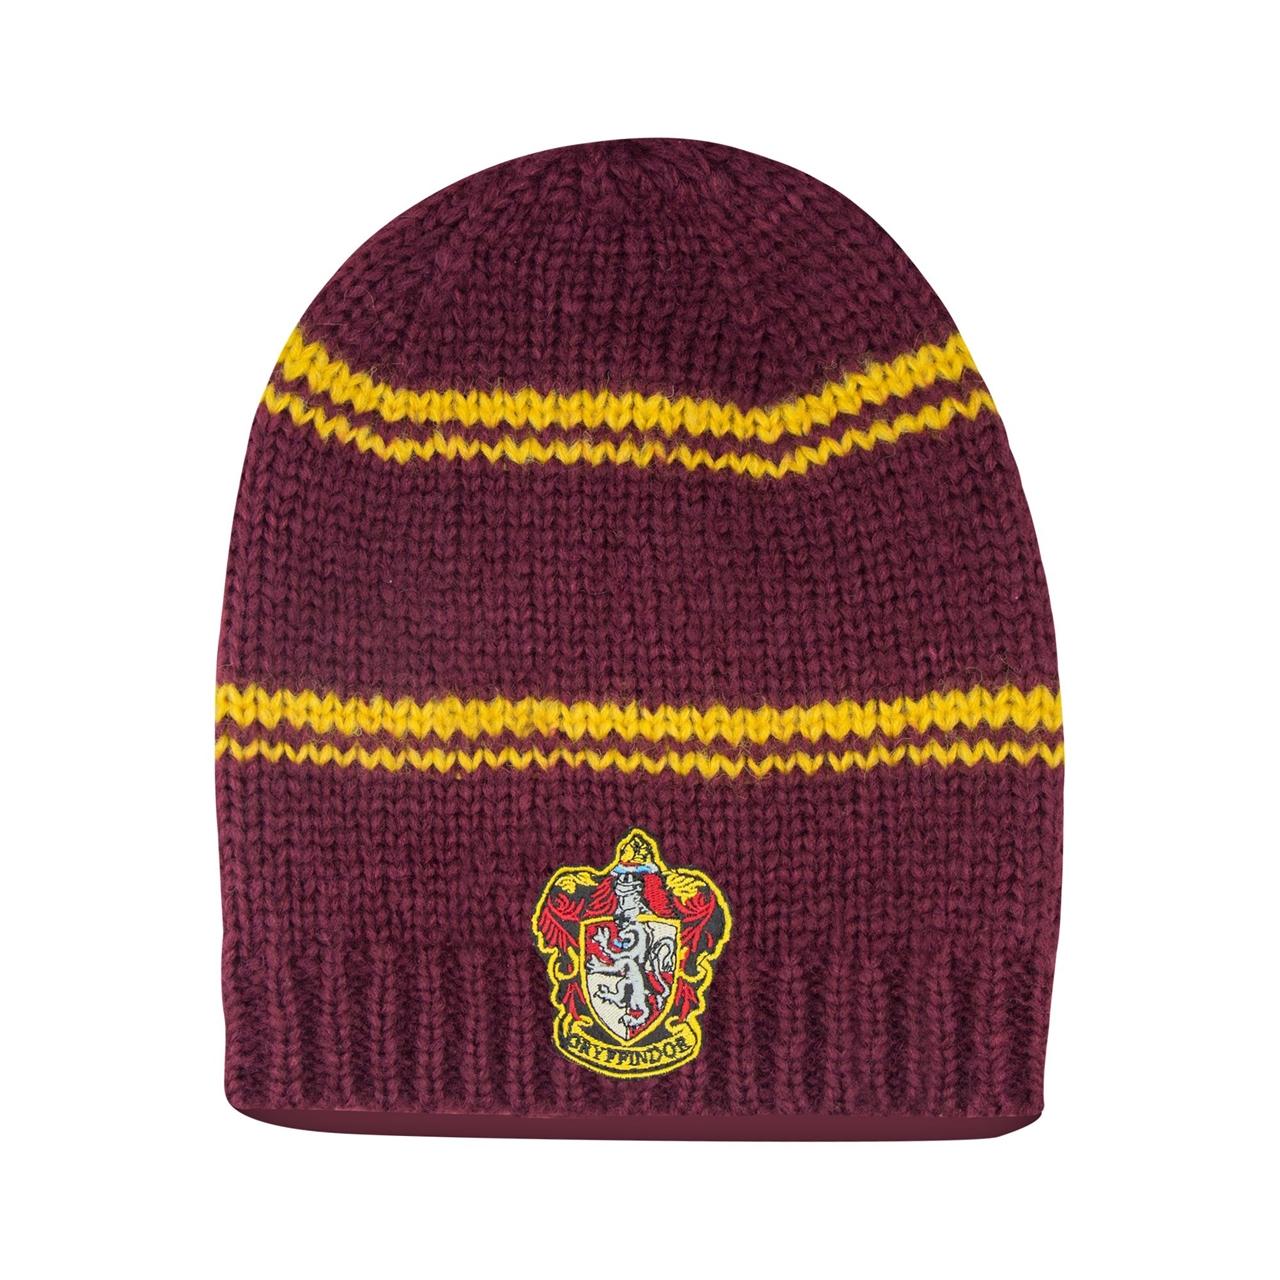 Imagen de Harry Potter Beanie Slouchy Gryffindor